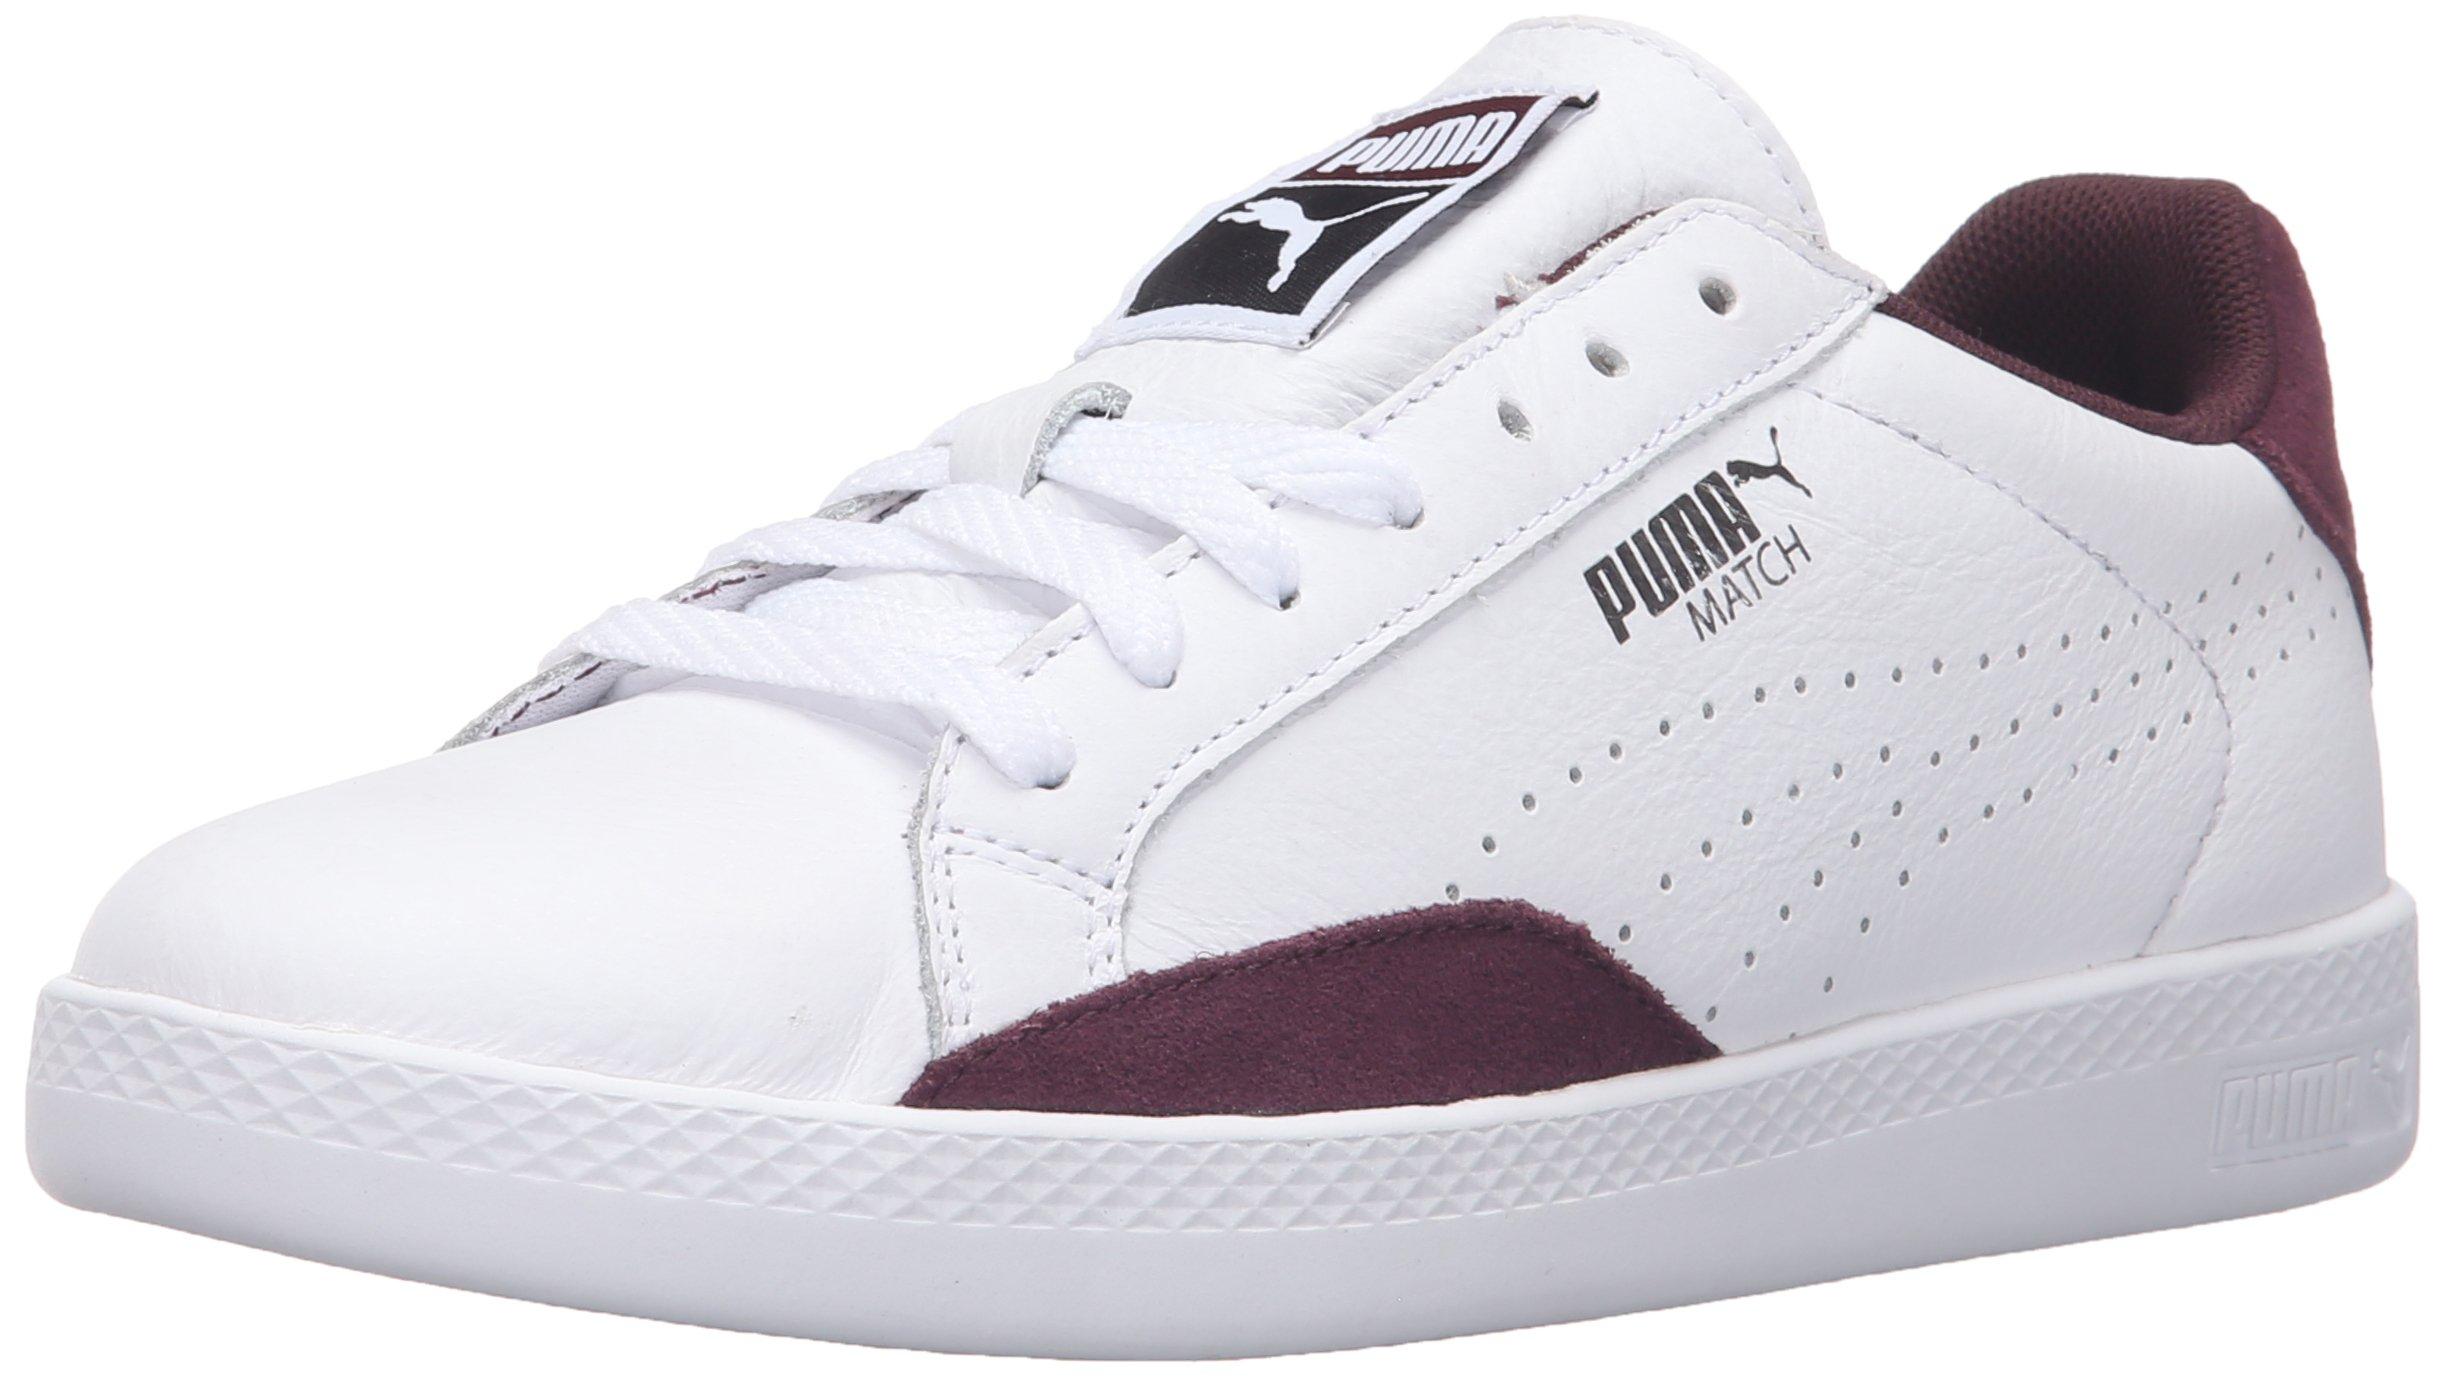 PUMA Women's Match LO Basic Sports WN's Tennis Shoe, White/Winetasting, 8.5 M US